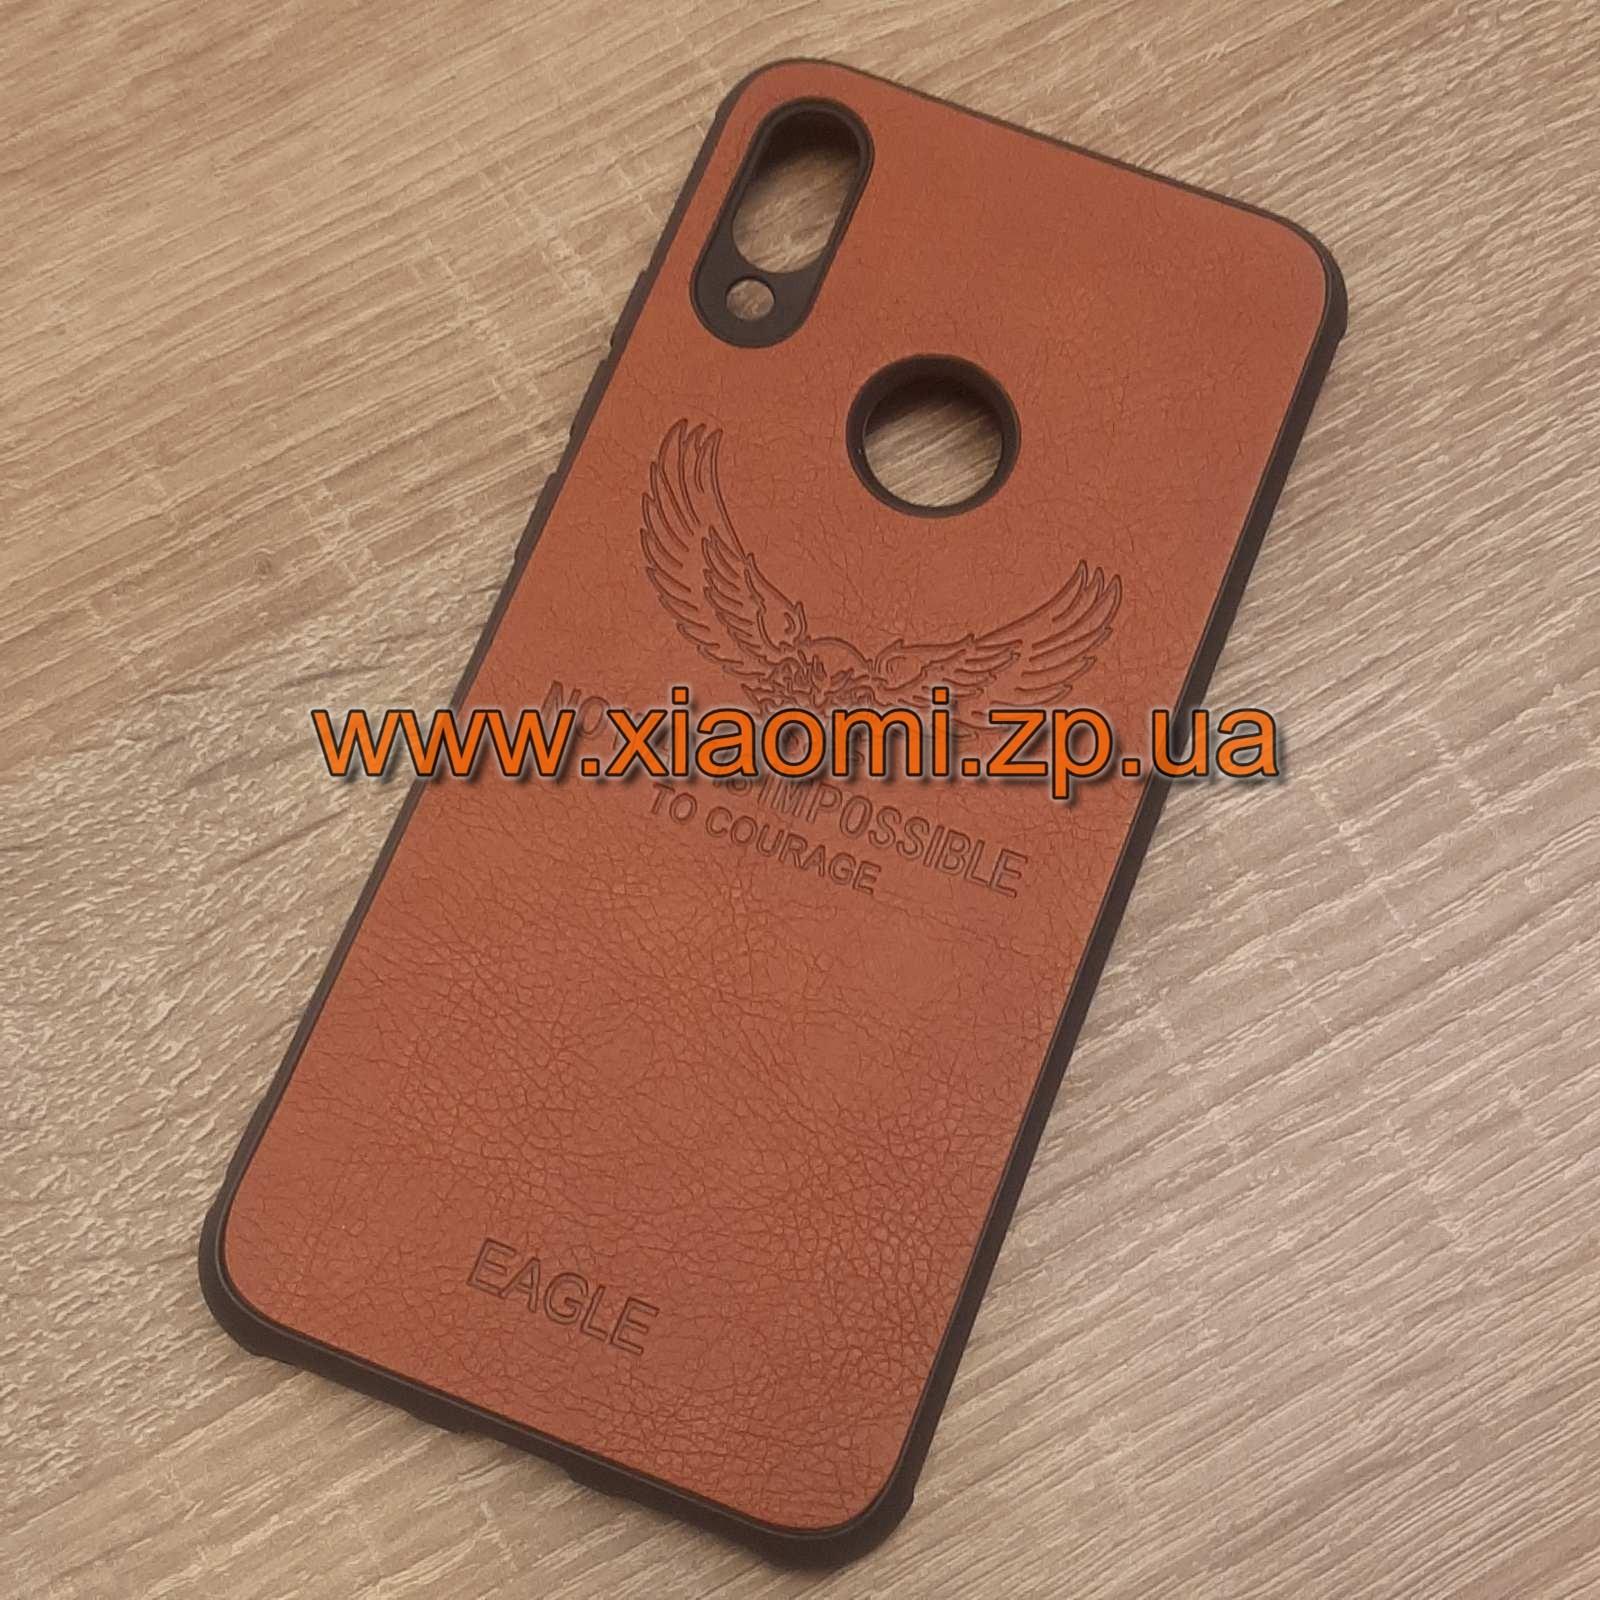 Чехол накладка для Xiaomi Redmi Note 7 / EAGLE